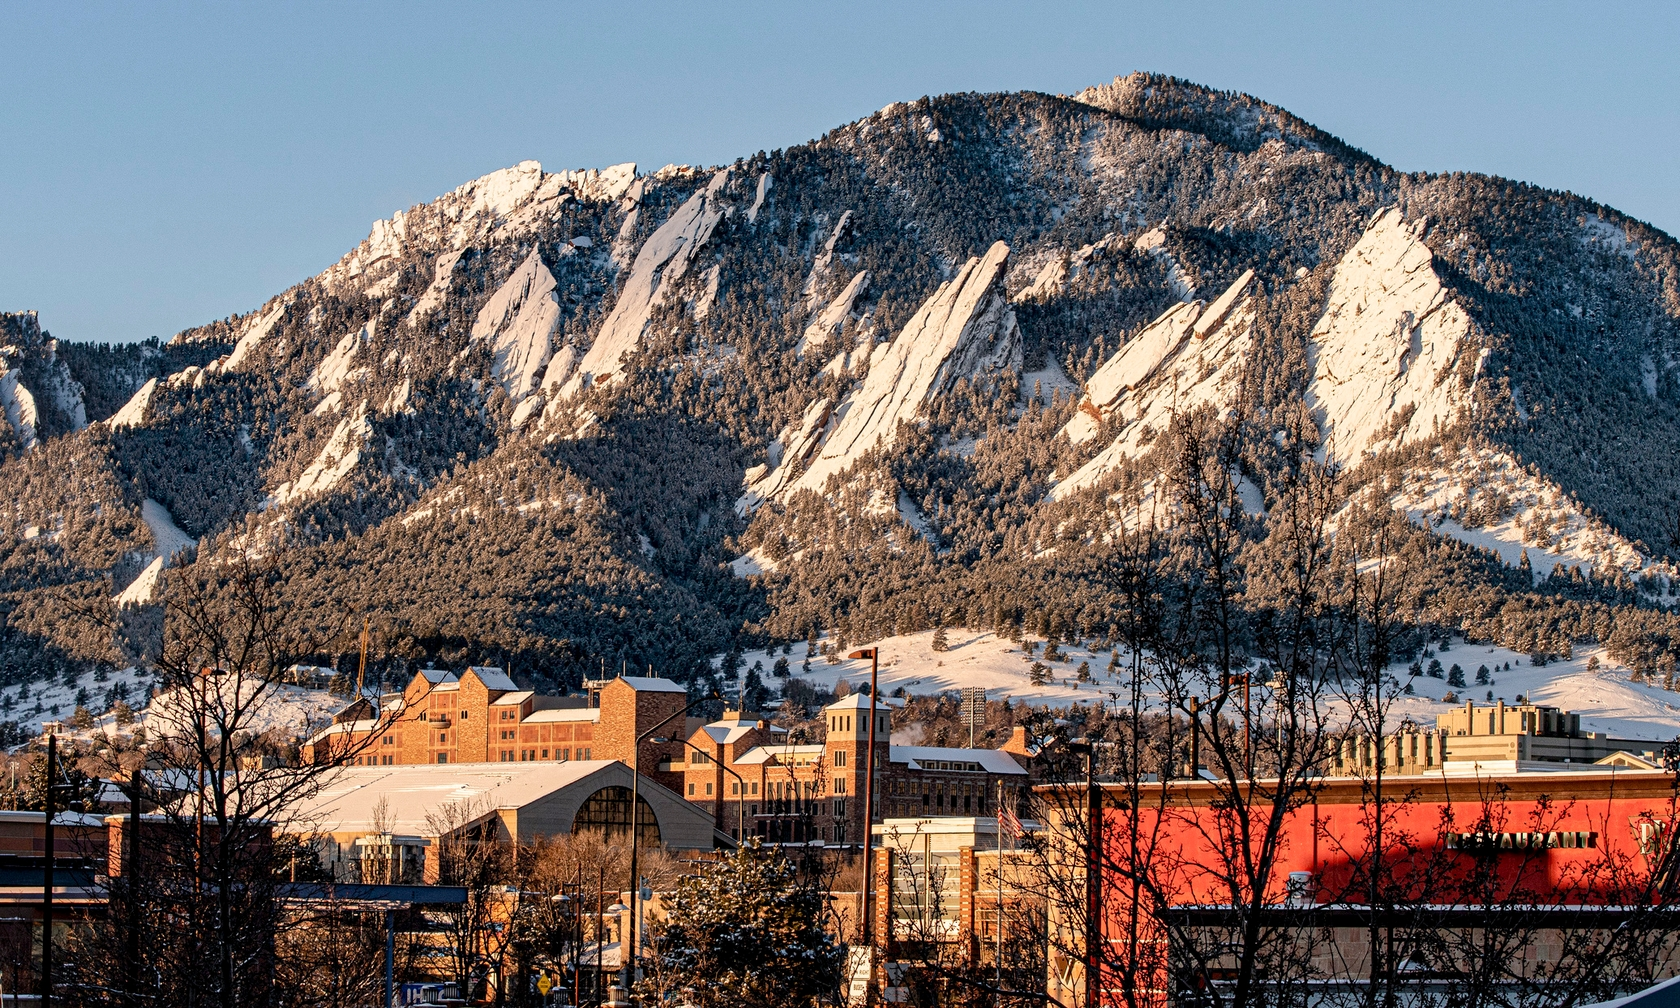 Vacation rentals in Boulder